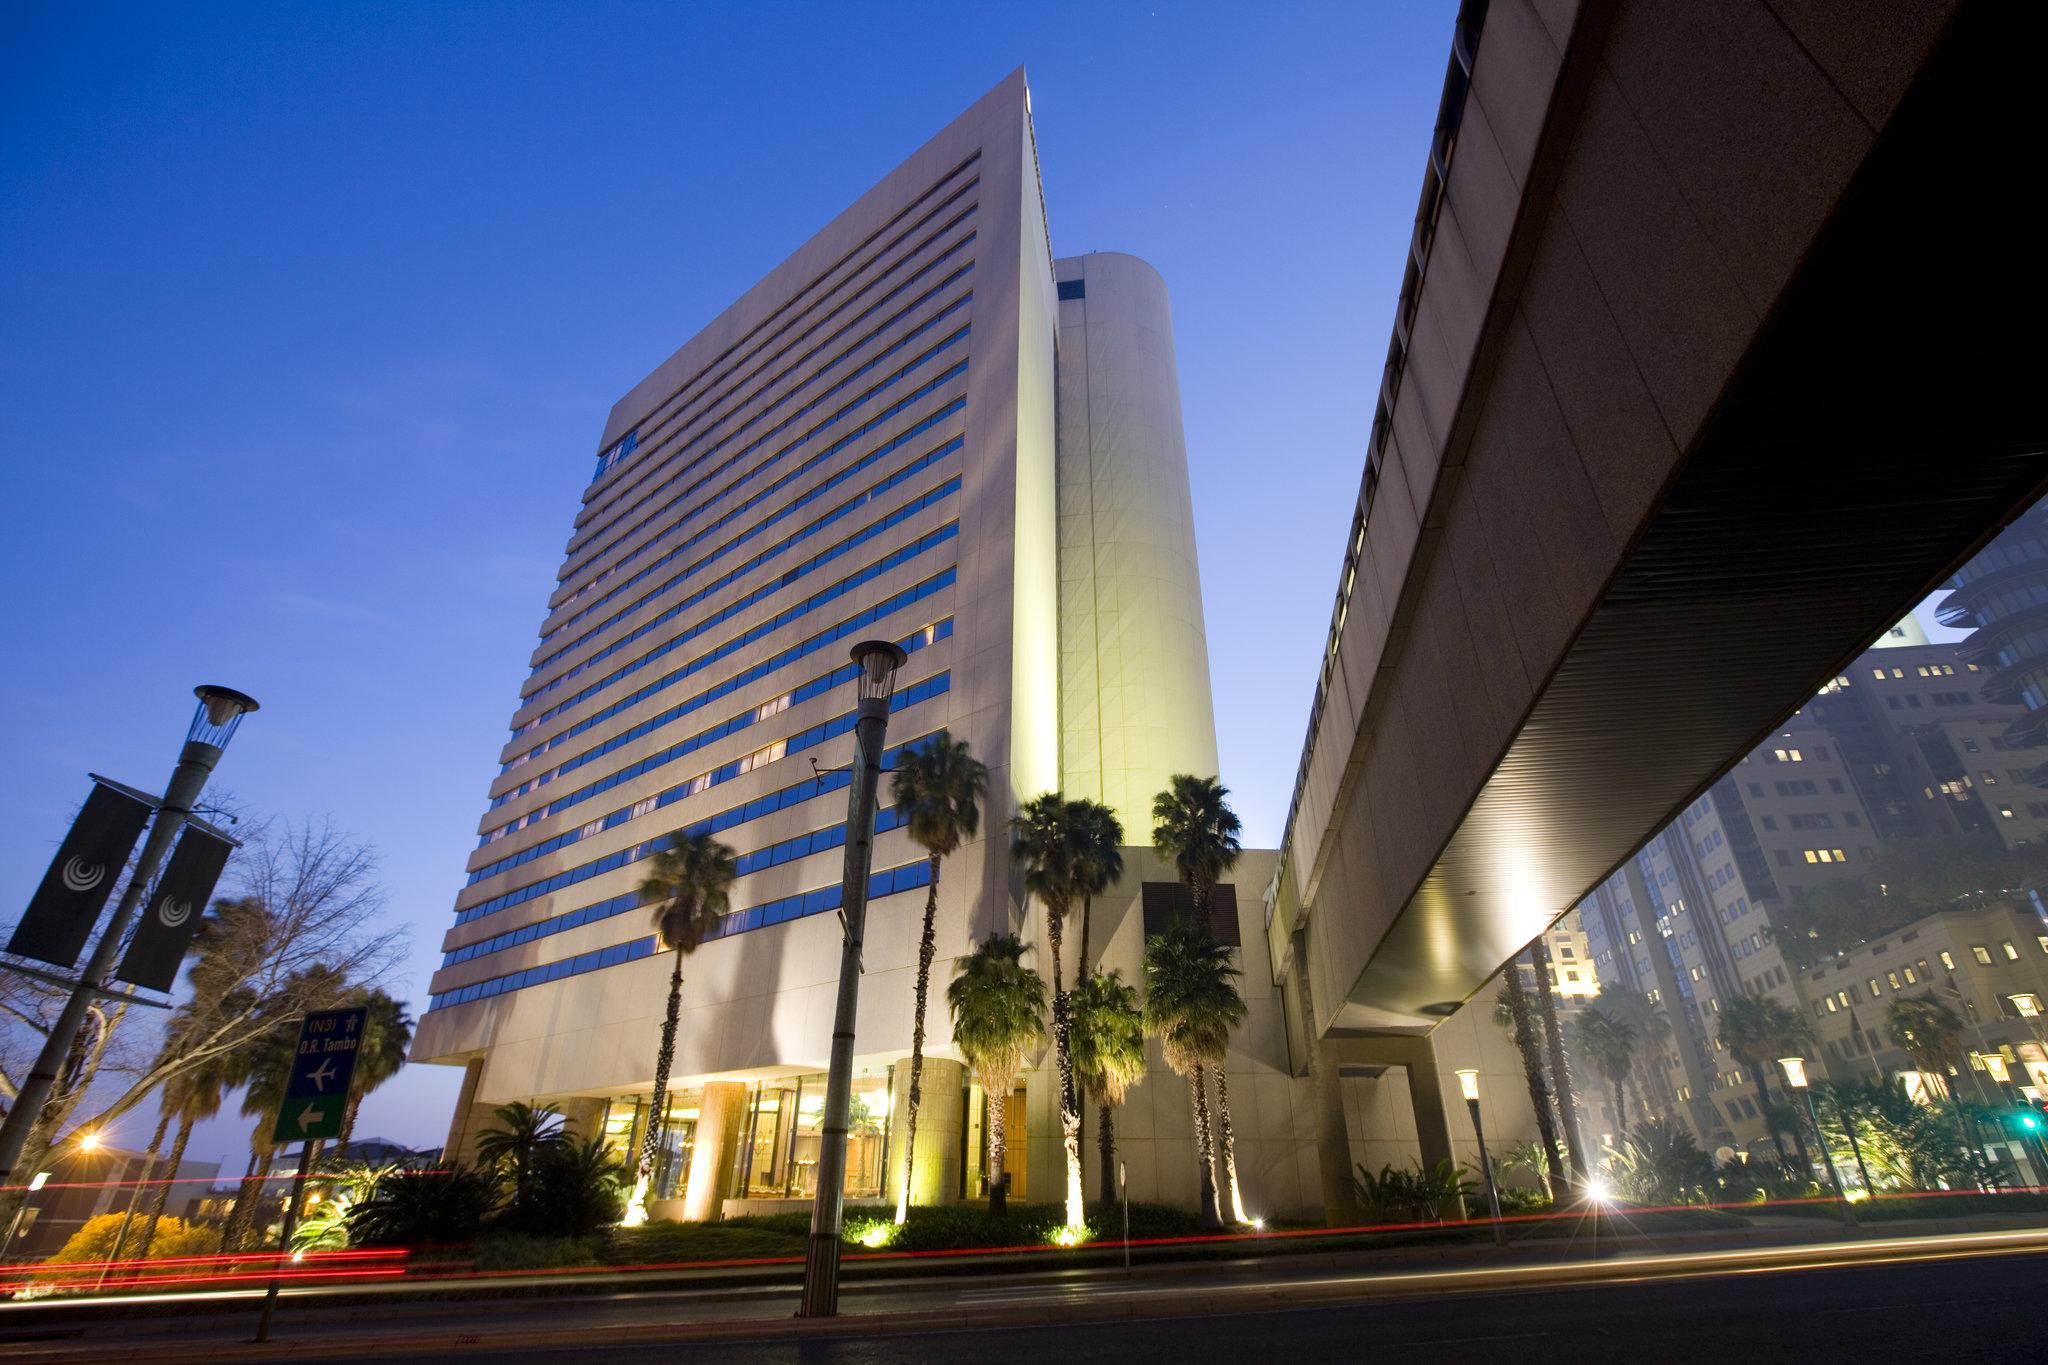 InterContinental JNB Sandton Towers